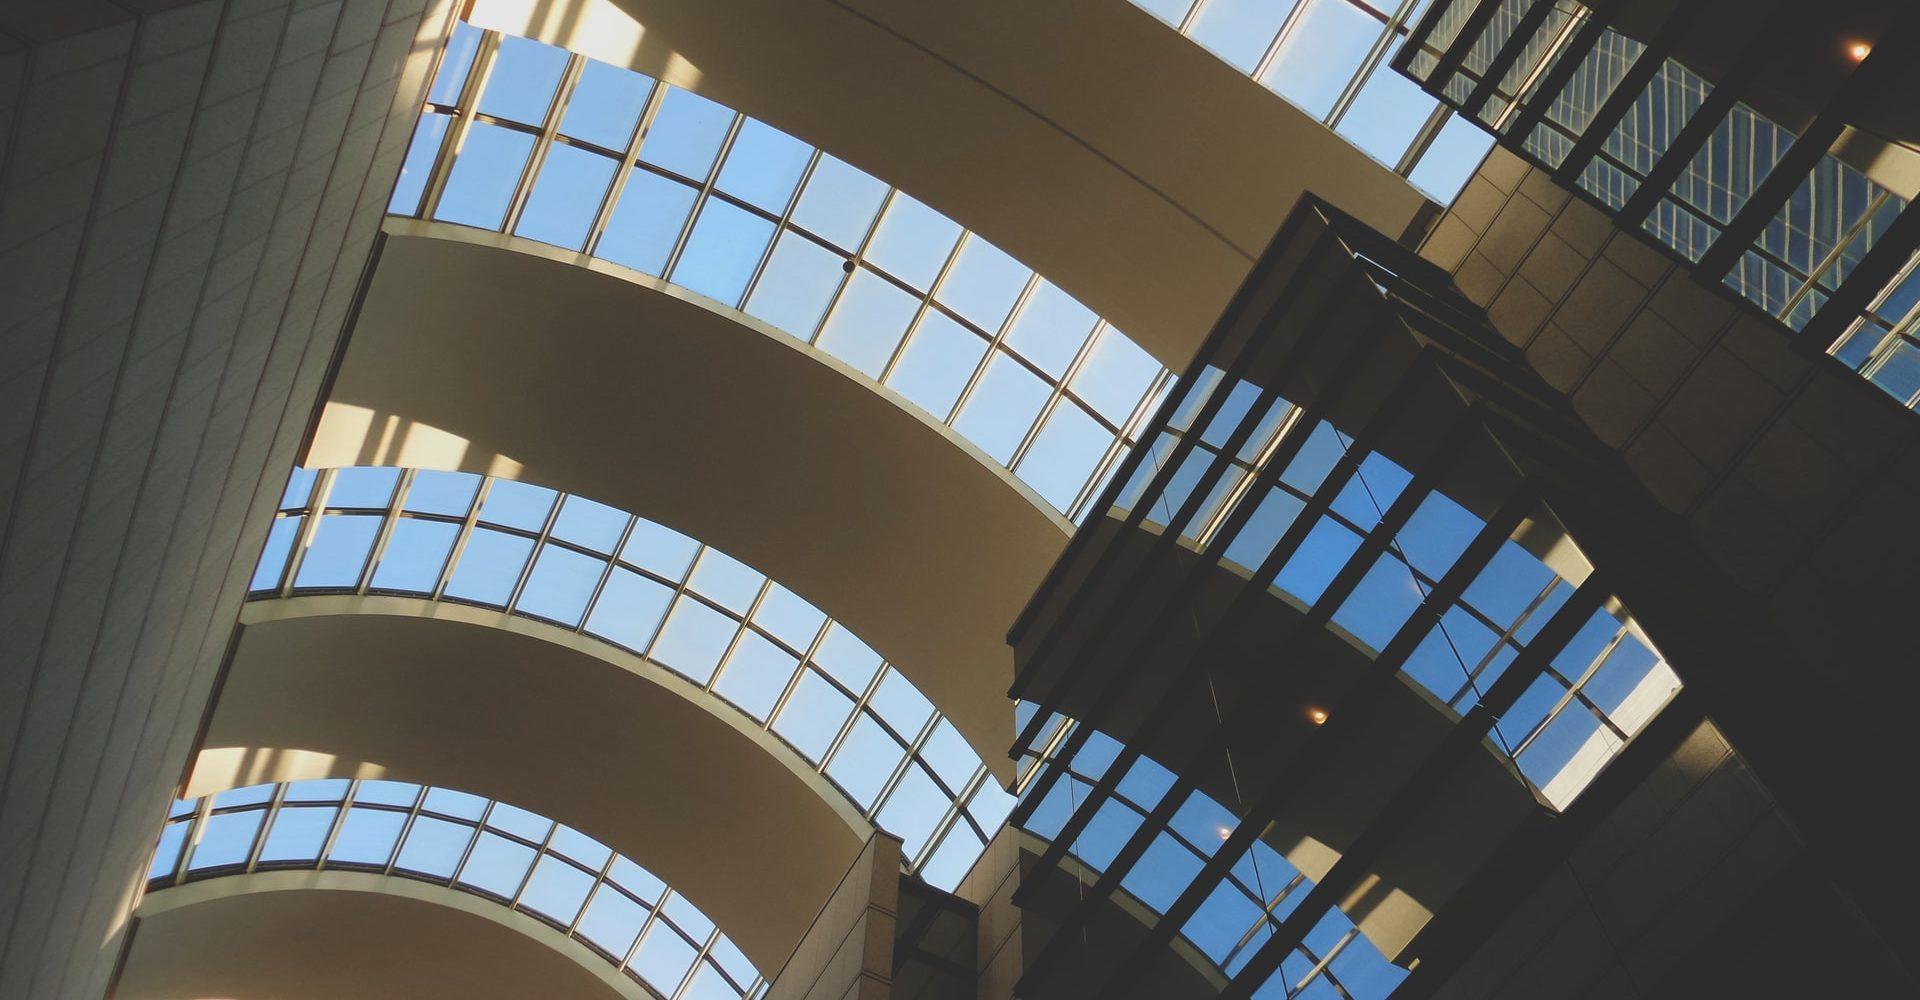 Skylight Installation Professionals in Toronto